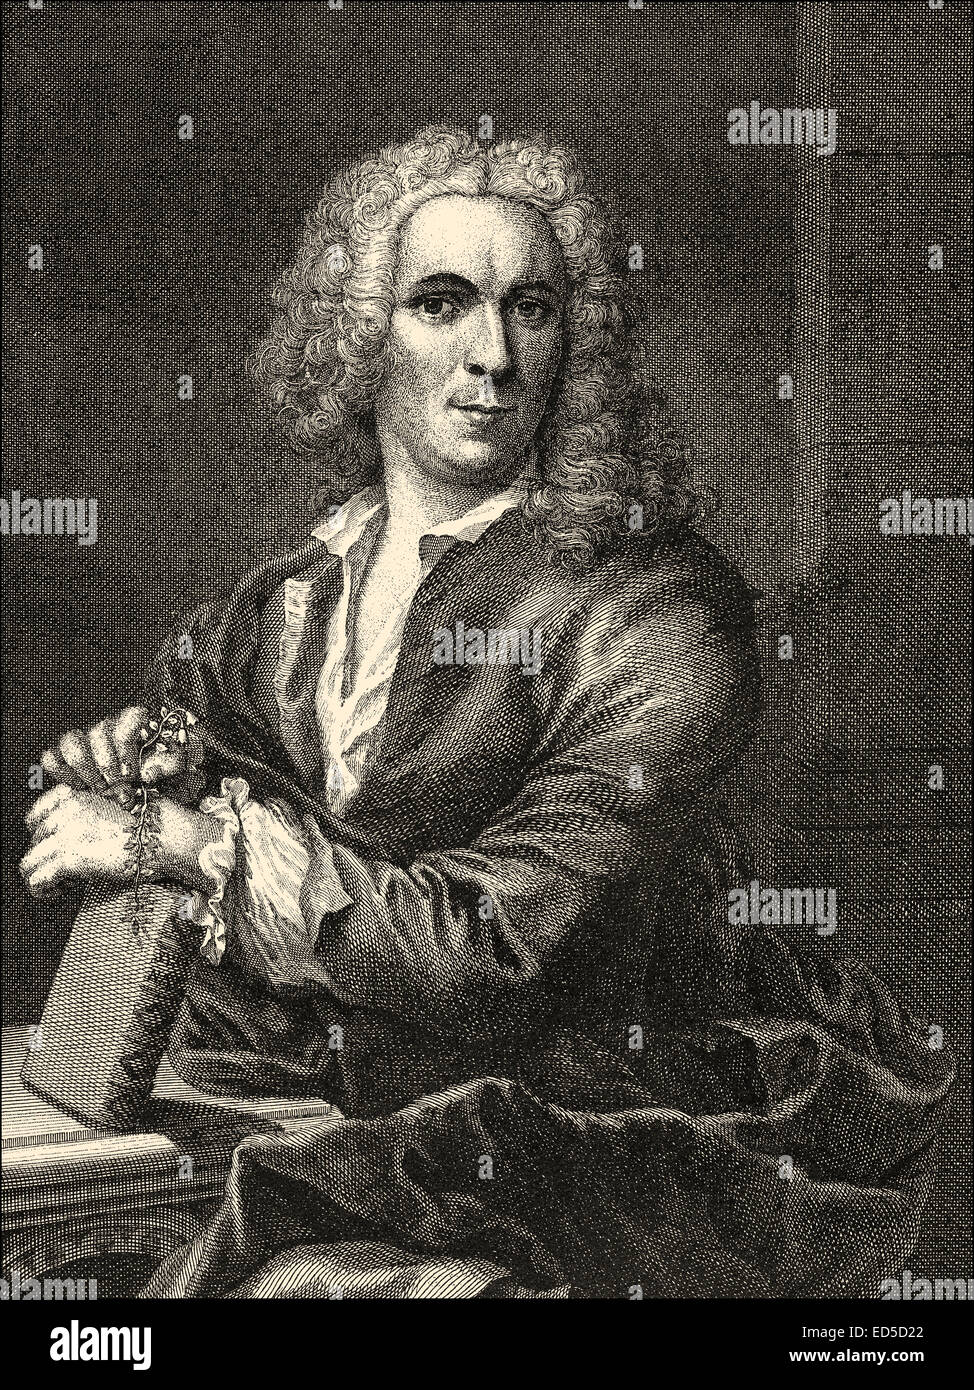 Carl Linnaeus,  or Carl von Linné, 1707-1778, a Swedish botanist, physician, and zoologist, Carl von Linné, oder Carl Nilsson Li Stock Photo